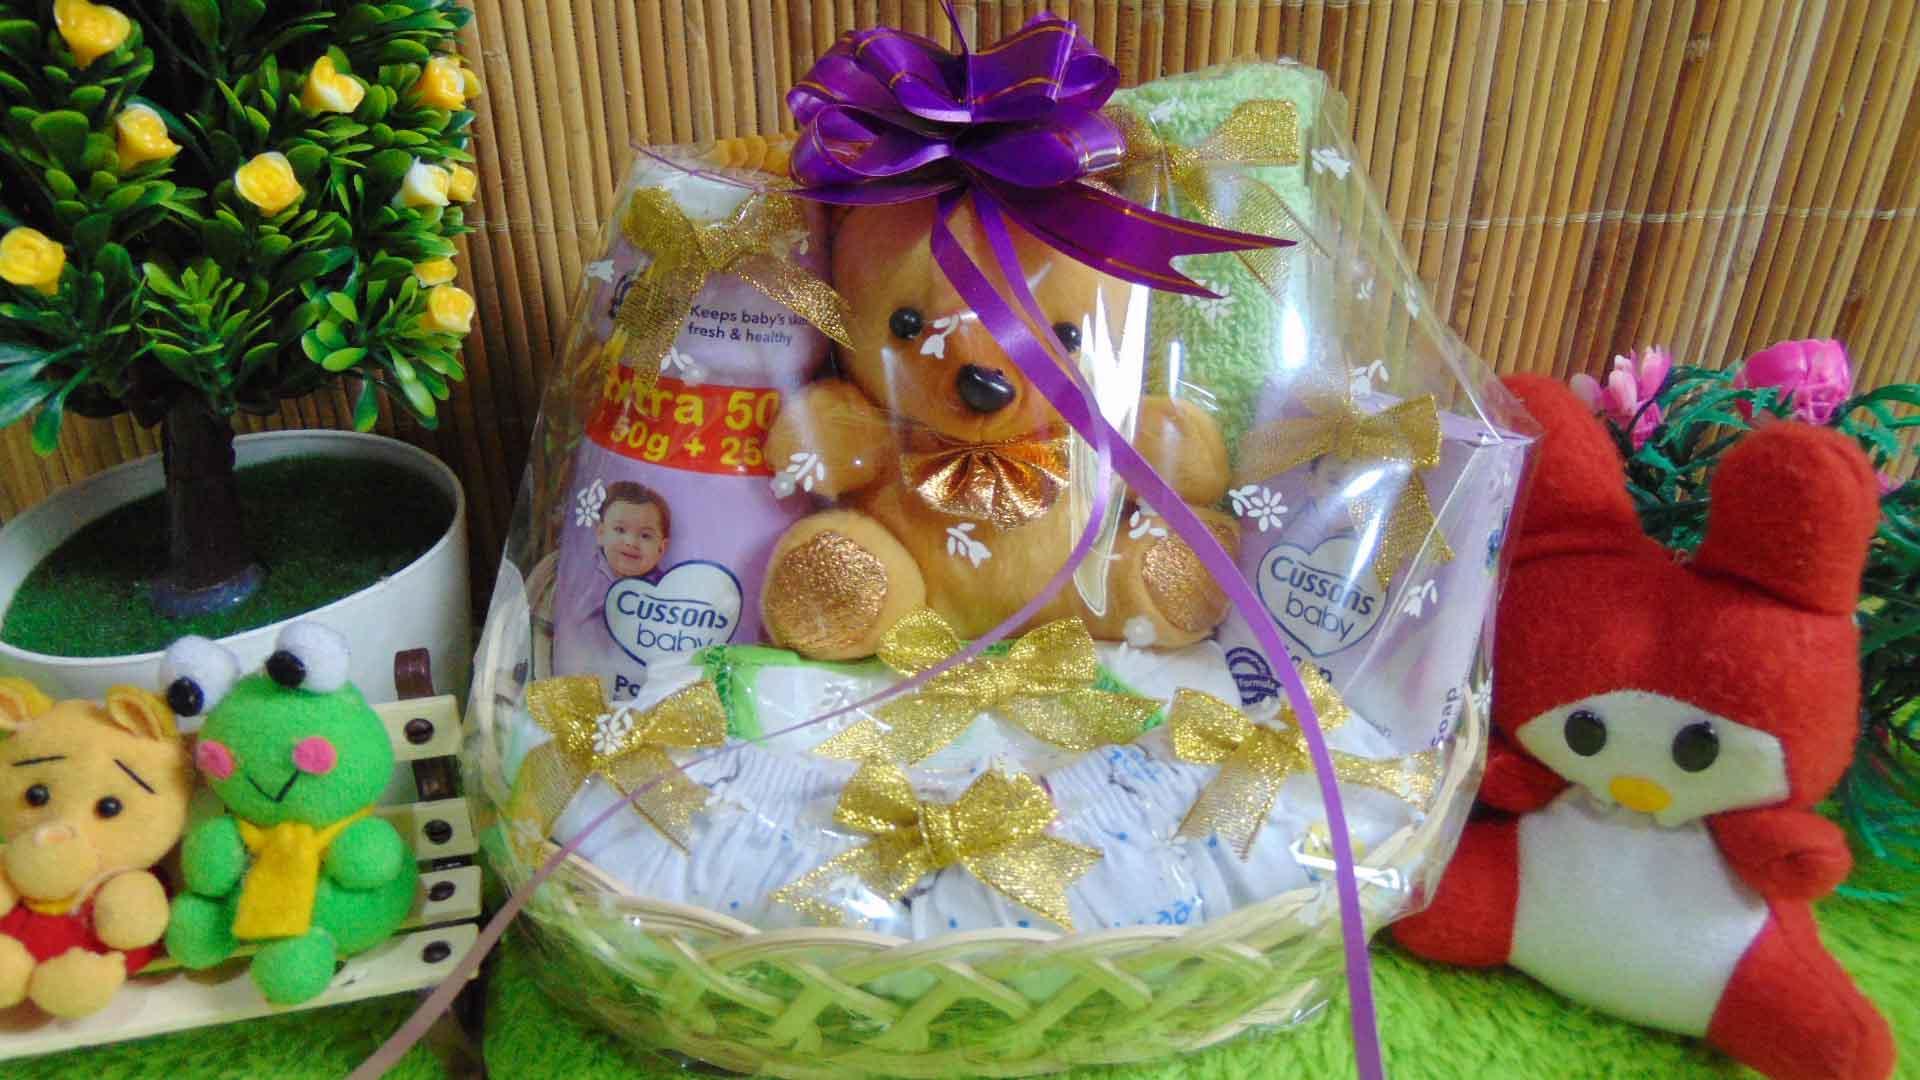 kembarshop - TERLARIS paket kado bayi baby gift – kado melahirkan-parcel kado – parsel bayi- keranjang oval super imut komplit ANEKA WARNA